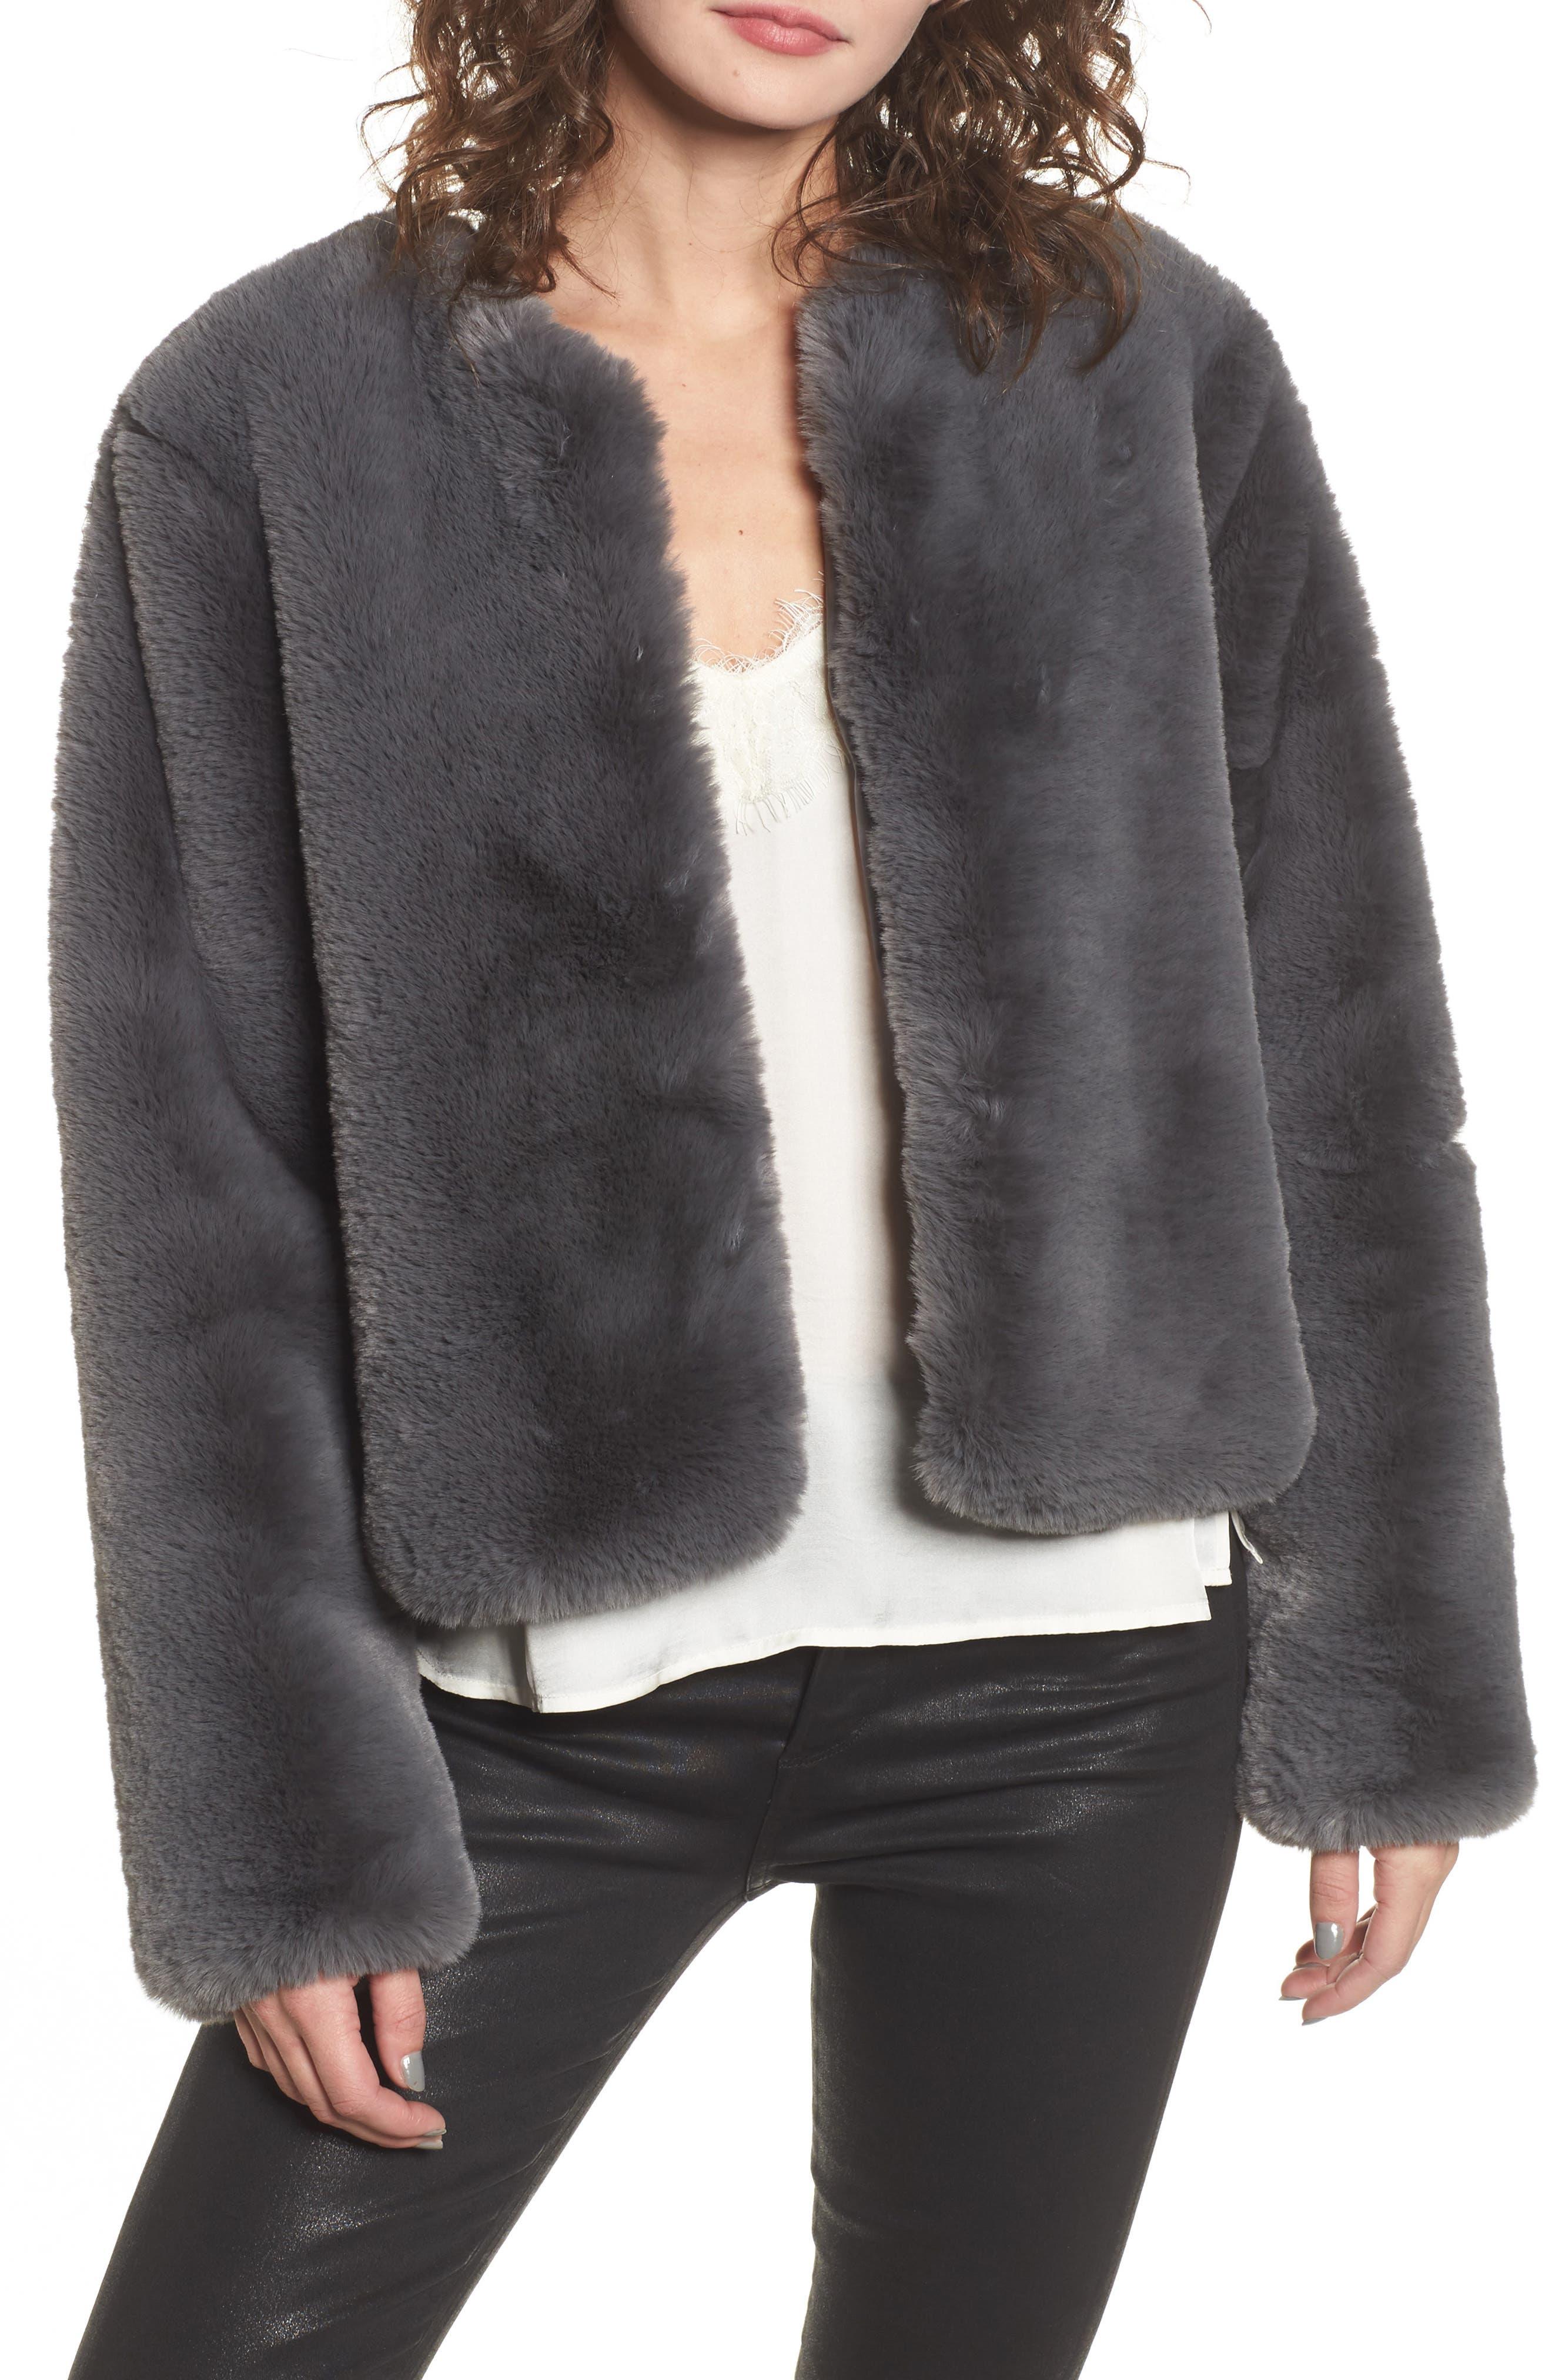 MOON RIVER Faux Fur Jacket